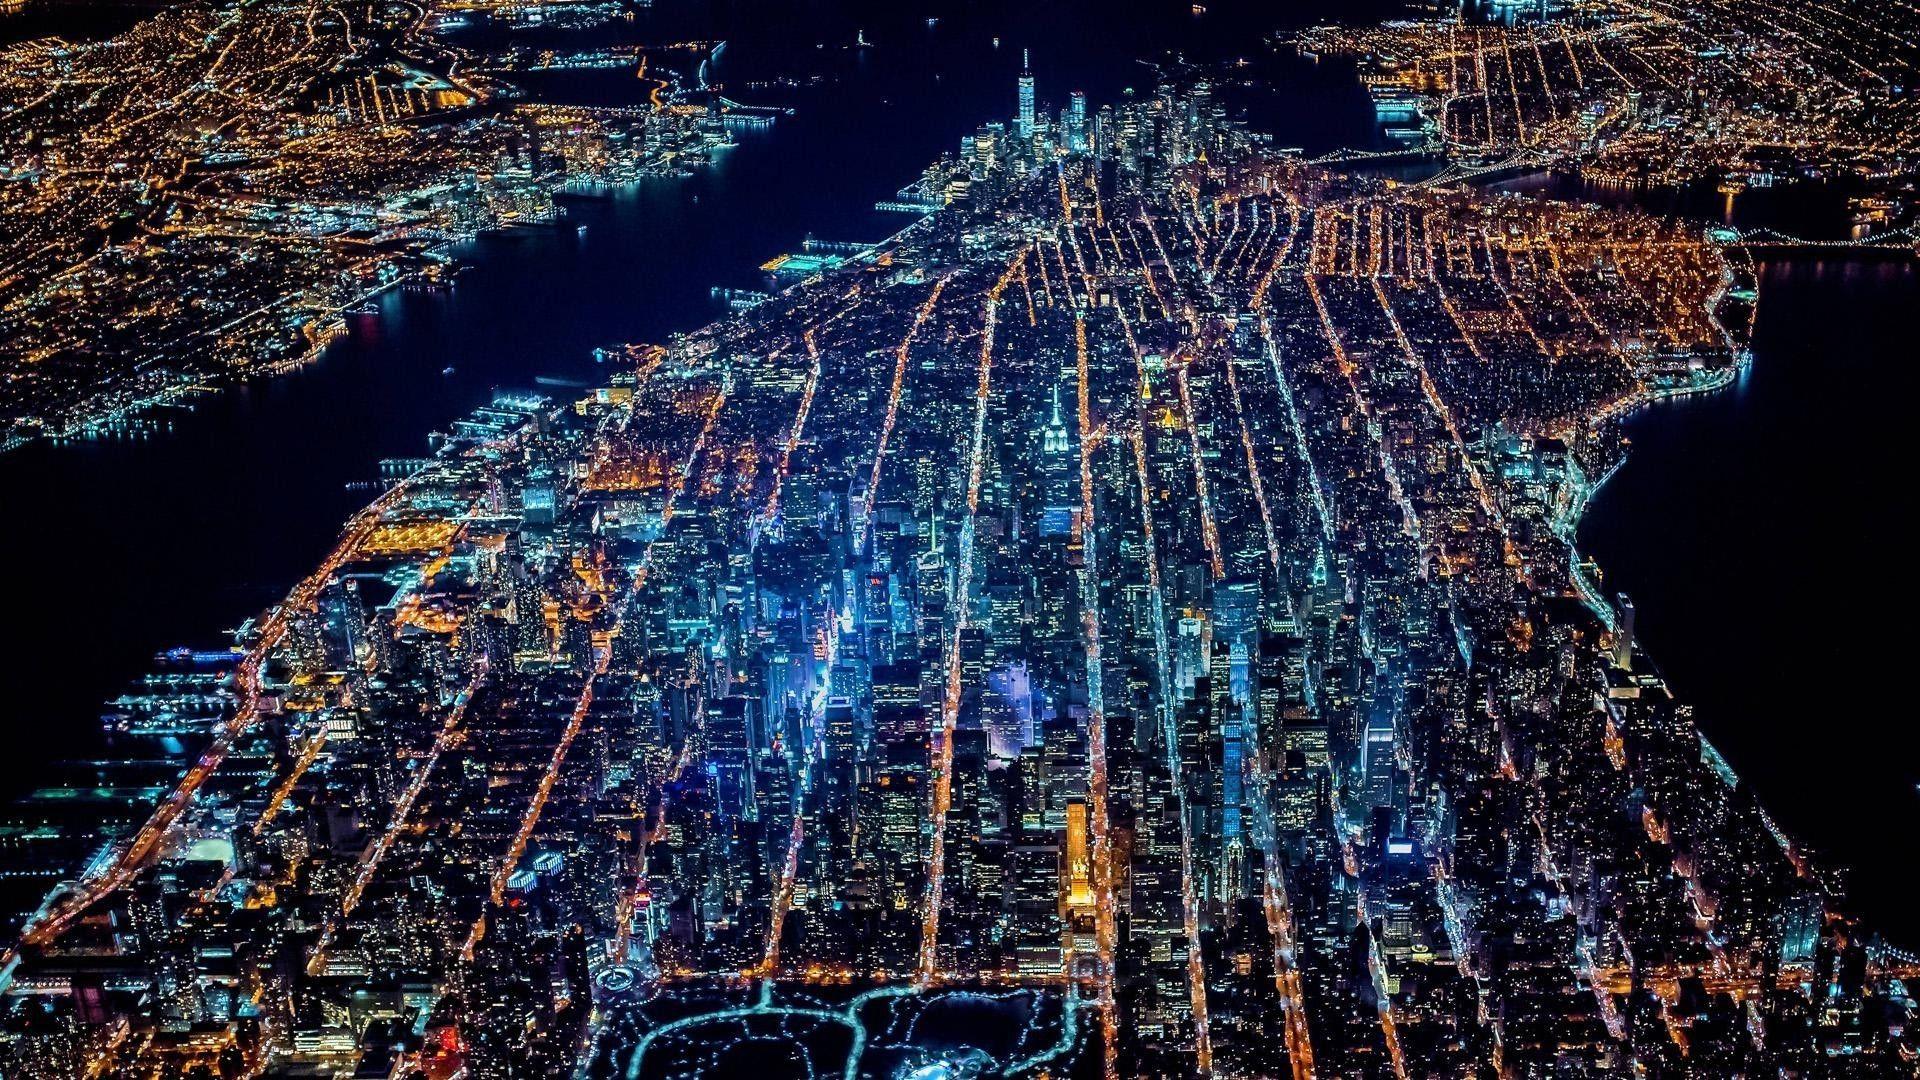 New York Wallpaper 088 New York Iphone Wallpaper City Wallpaper